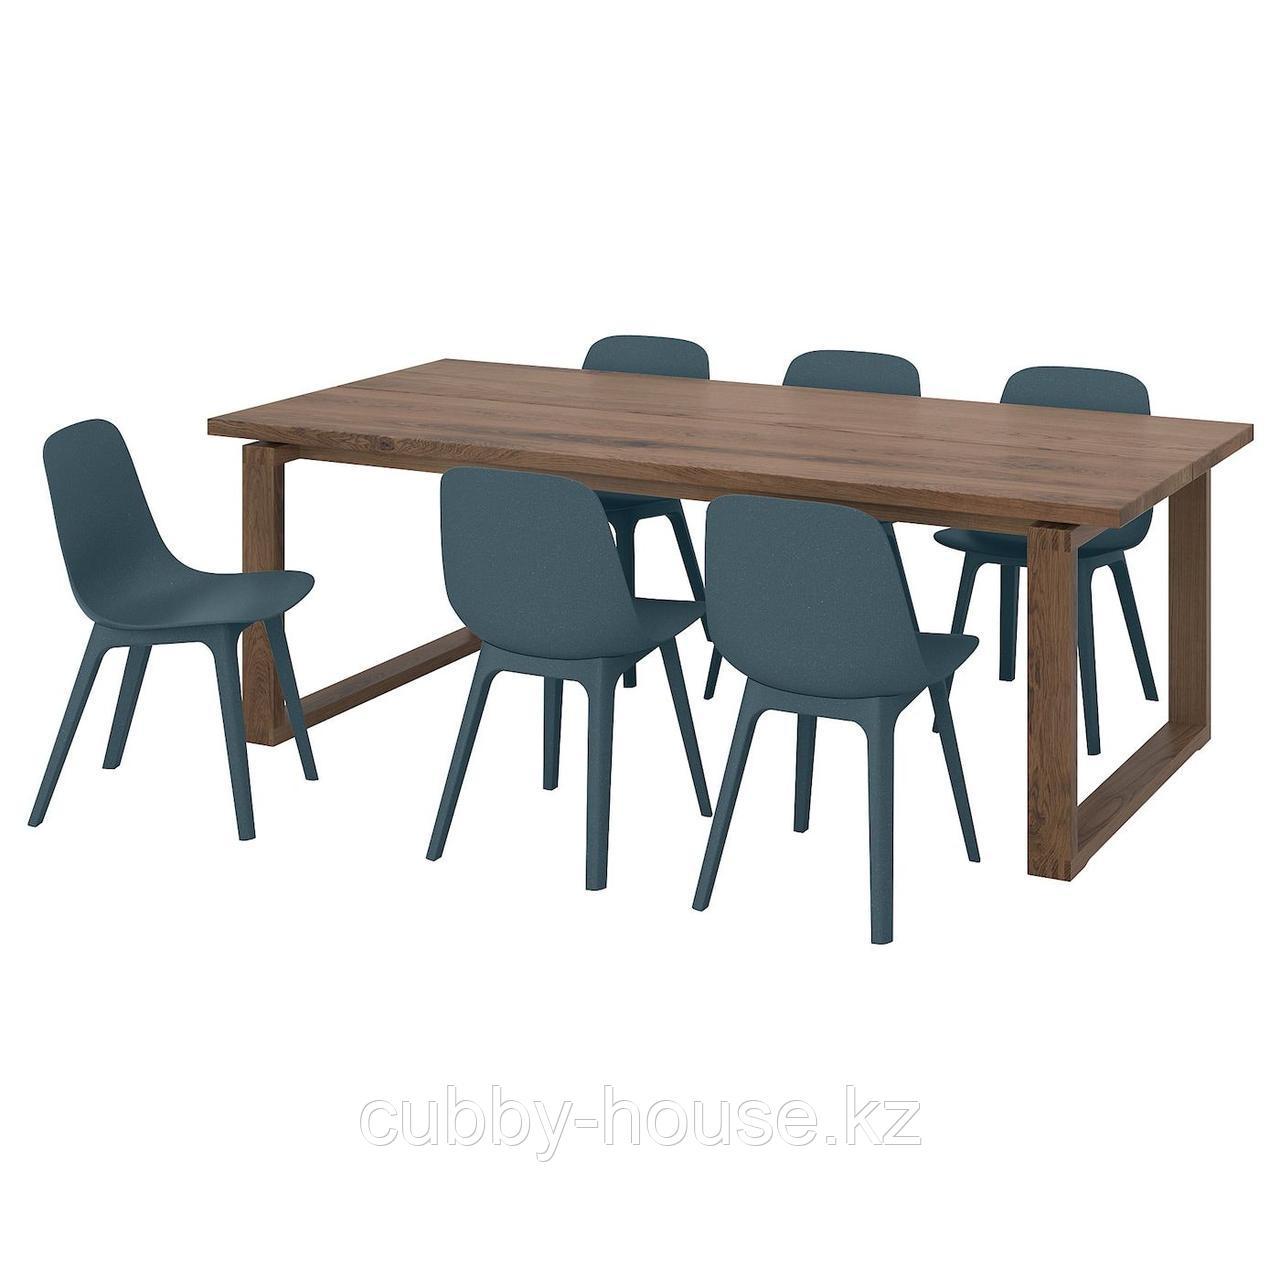 МОРБИЛОНГА / ОДГЕР Стол и 6 стульев, дубовый шпон, синий, 220x100 см